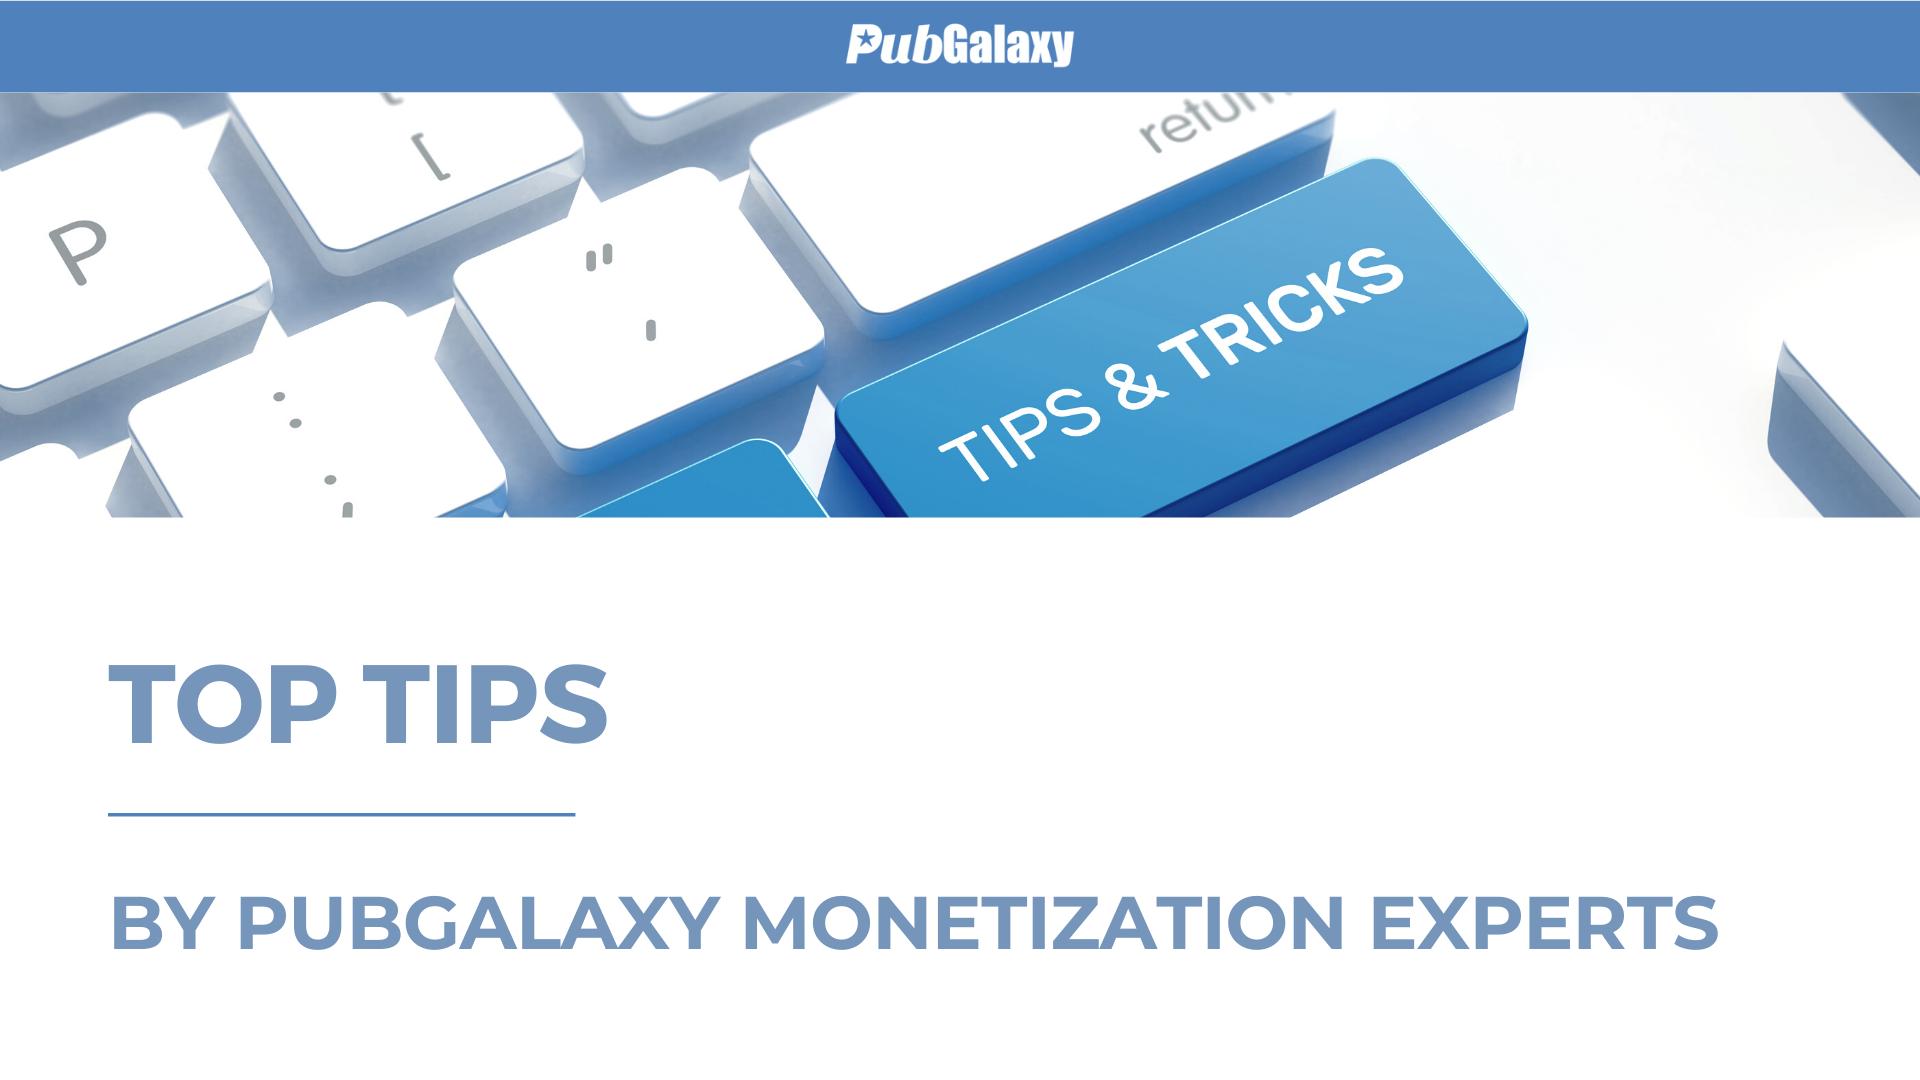 Top 10 Monetization Tips